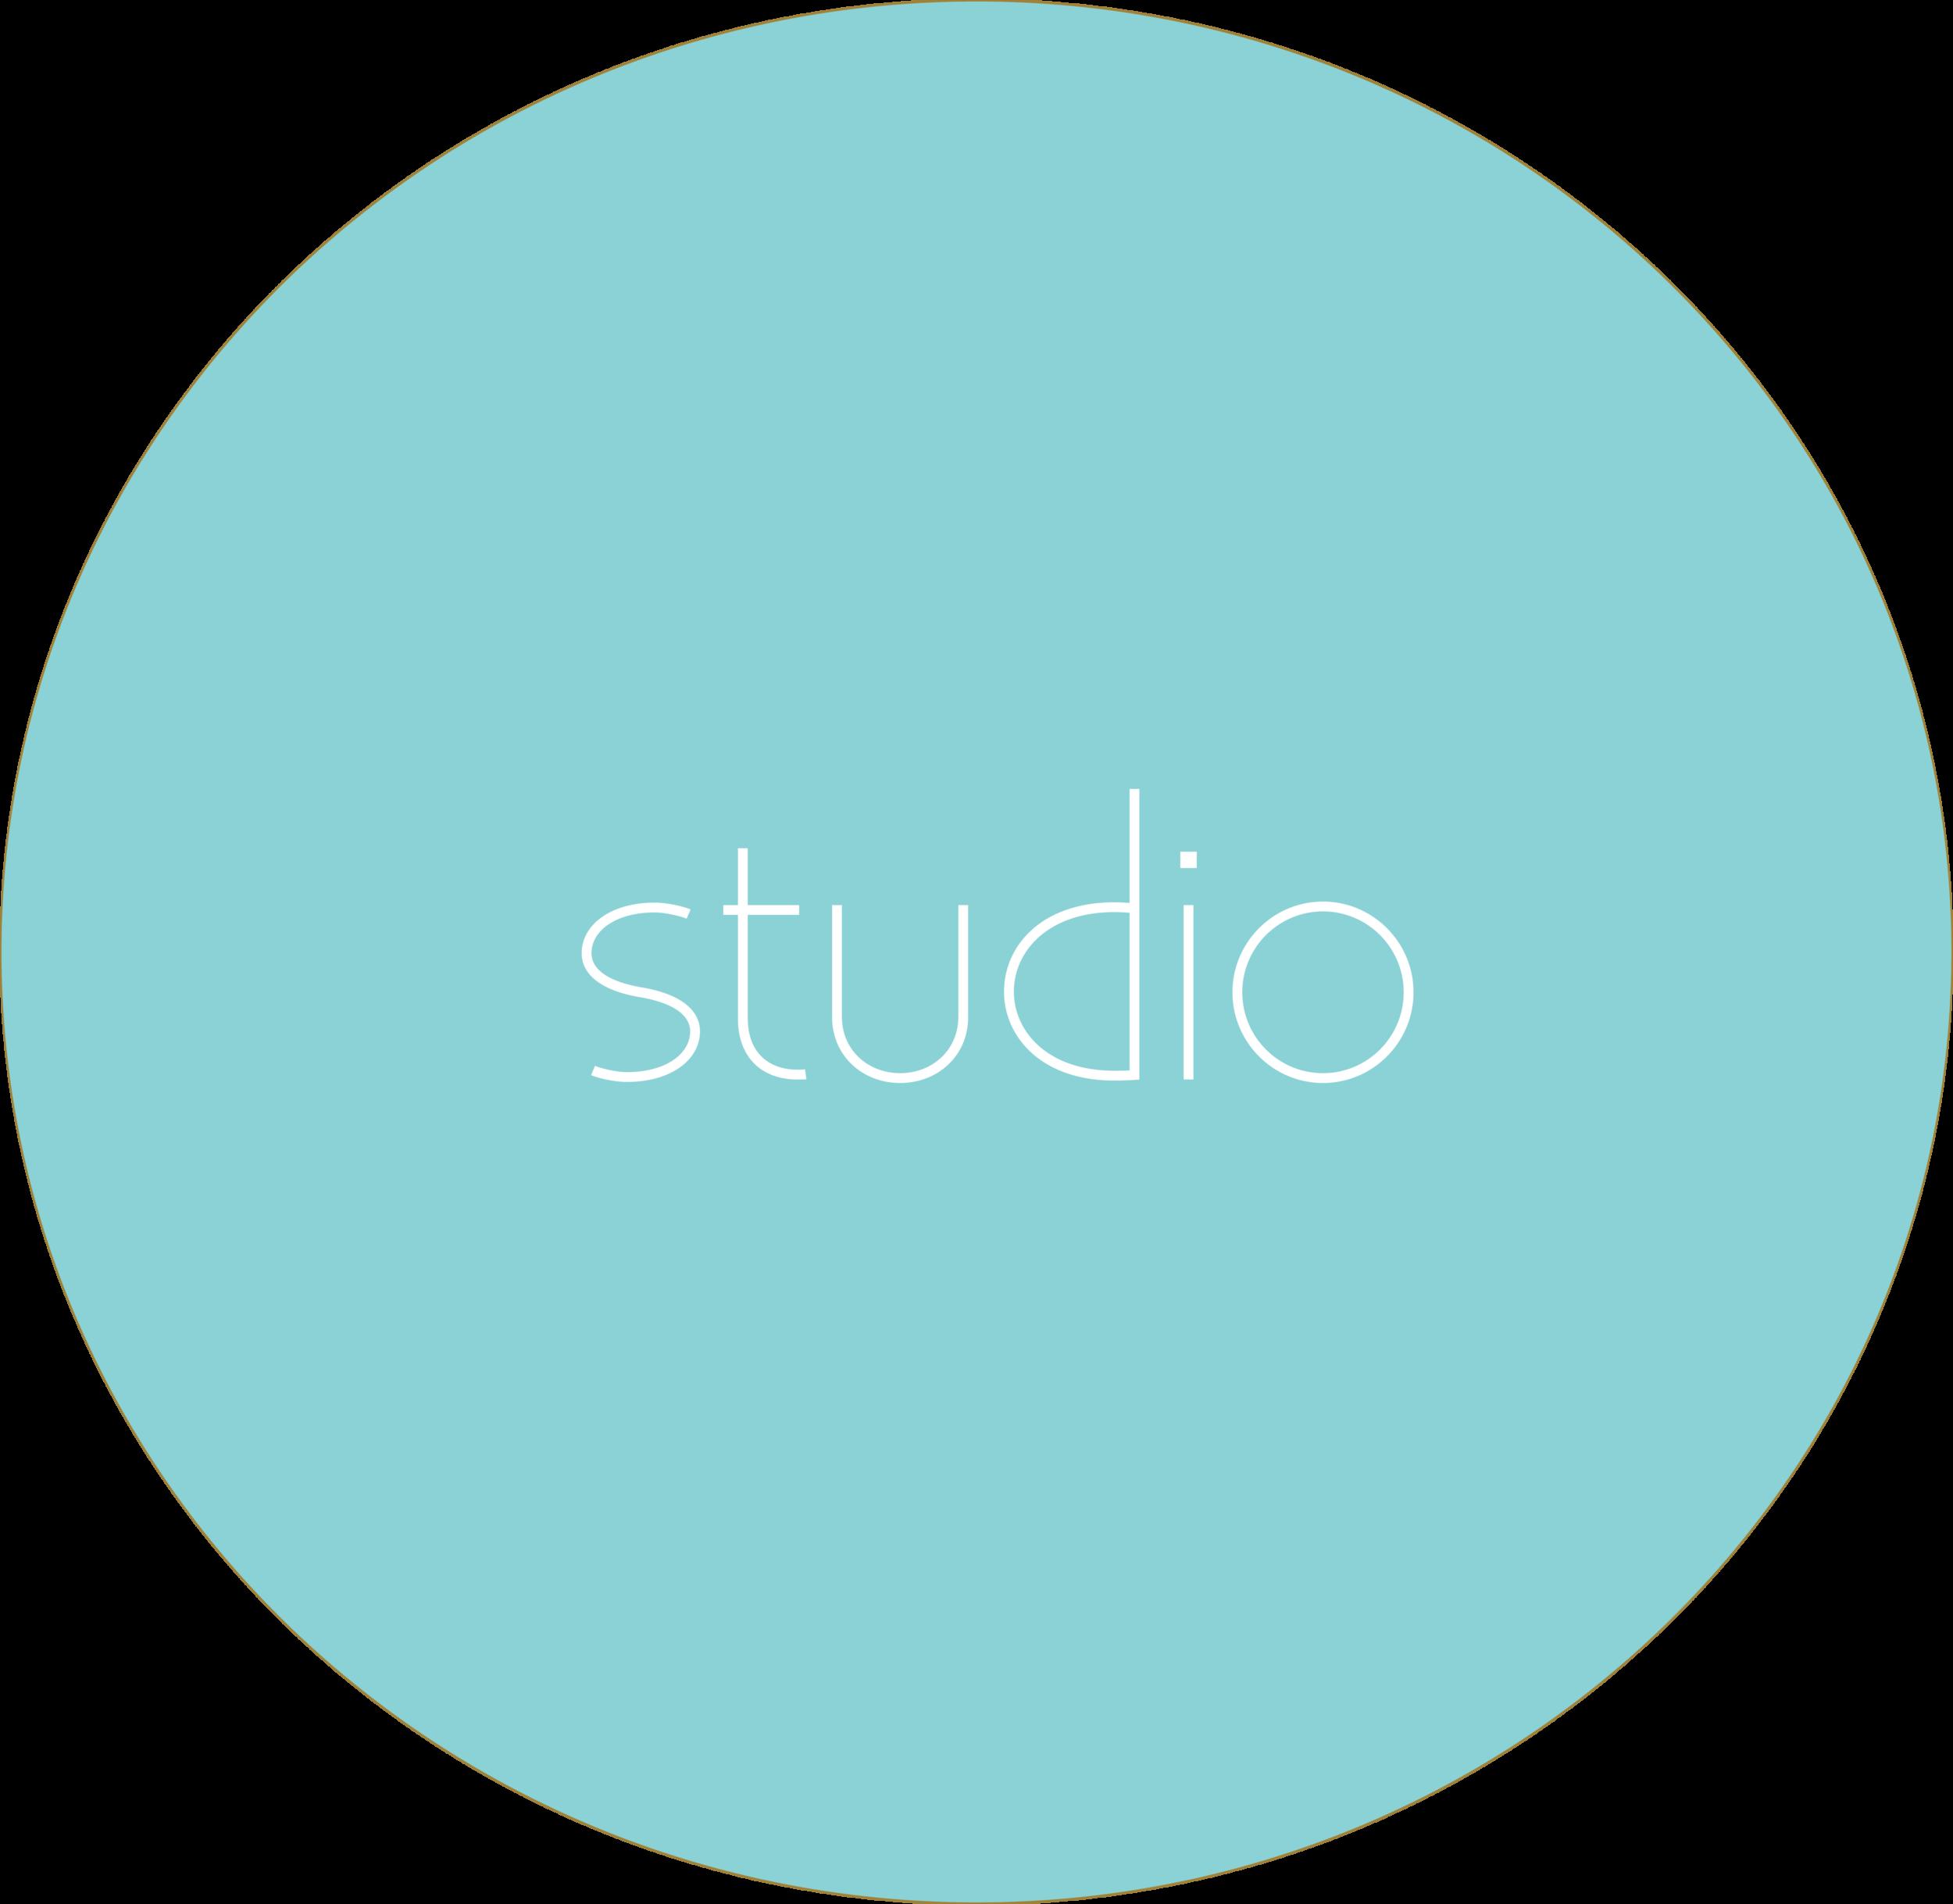 LP studio 1.png